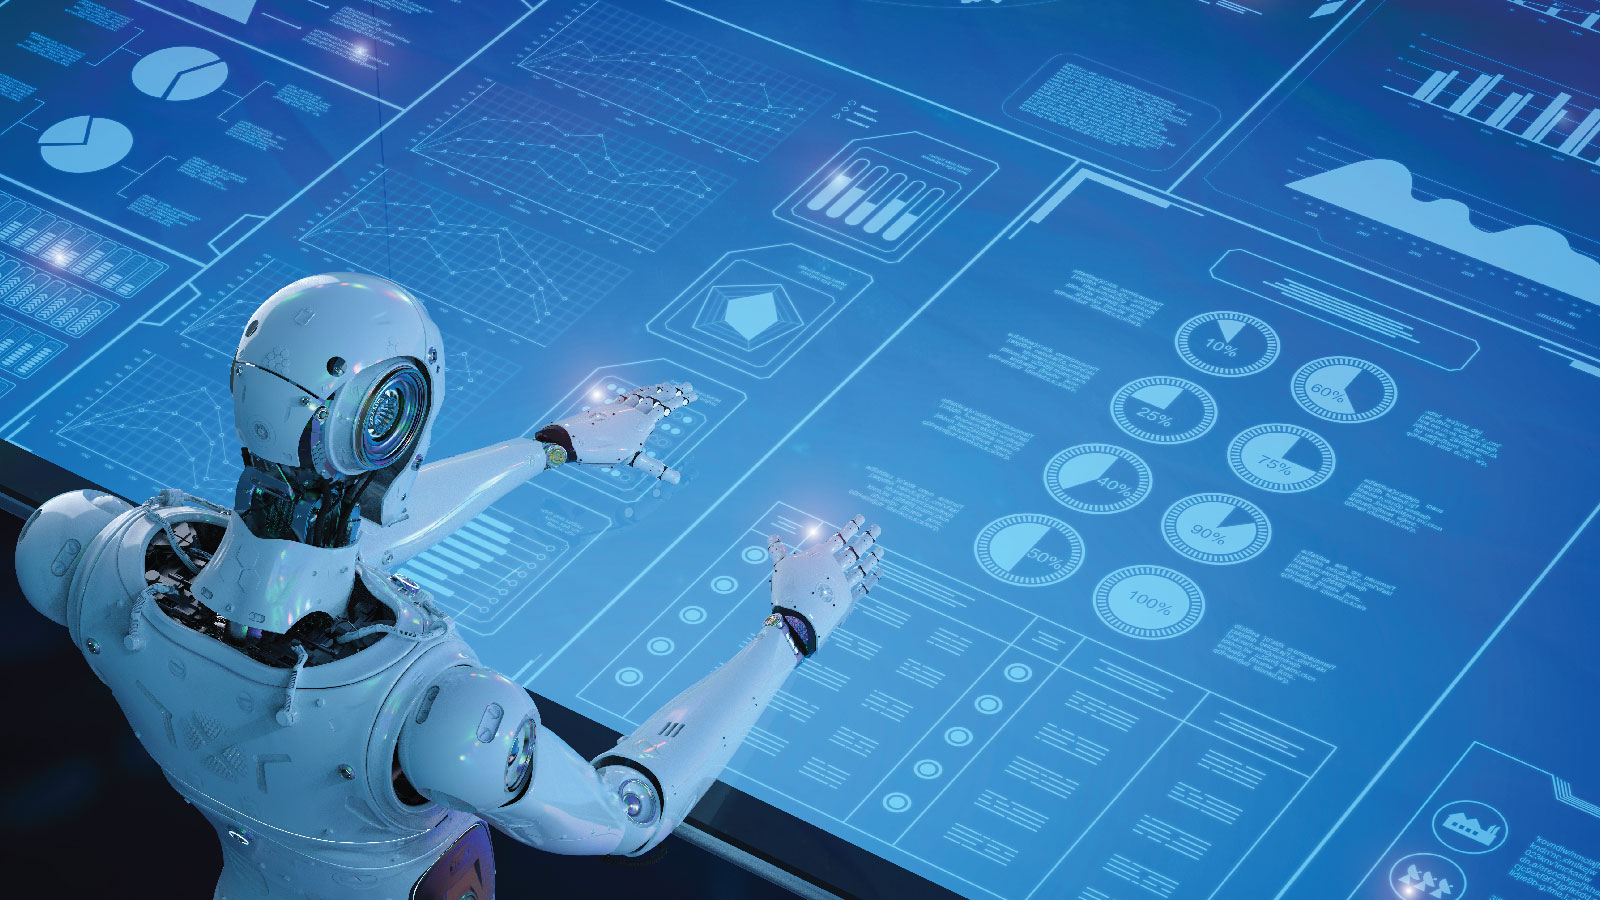 CIO, CTO, CEO, Robotic automation, Robotics, Automation, B2B B2B Enterprises, Robots, Robotic automation, Tom Galluzzo, IAM Robotics, Deloitte, IBM, Robotics Business Review, Robotic process automation, RPA, Algorithms, Forrester, International Federation of Robotics, RPA bots, Walmart, Alibaba, Amazon, Automation, AI, ML, Machine learning, Artificial Intelligence, IT, Warehouse